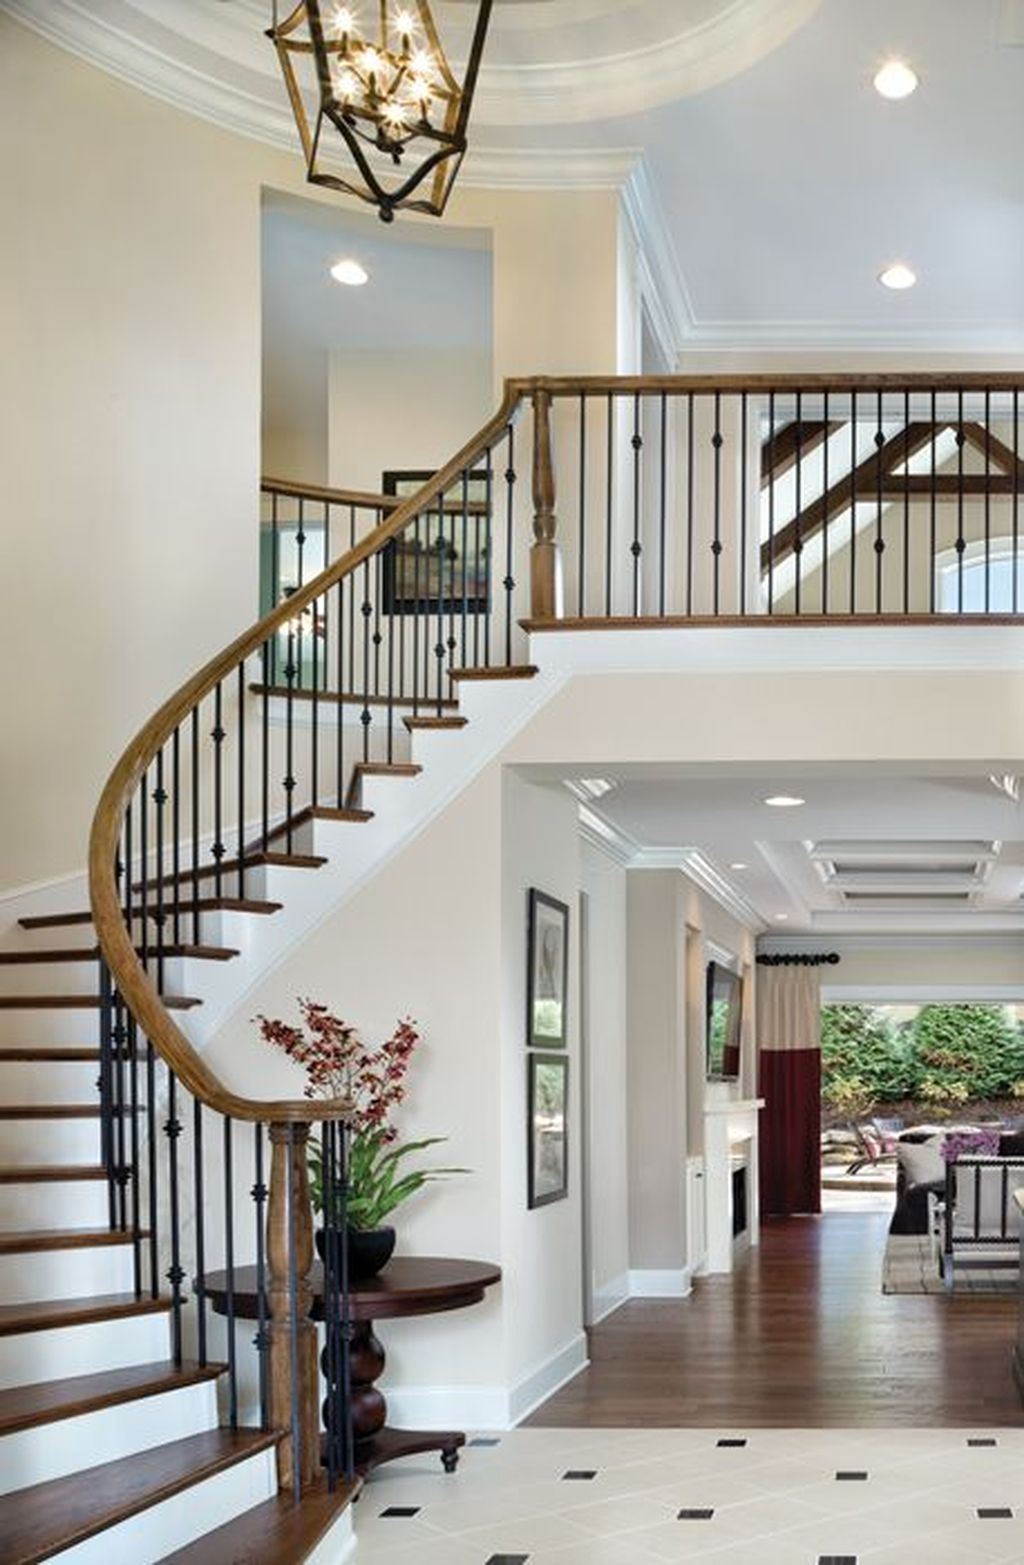 20+ Cool Foyer Designs Ideas For Home   Foyer design ...